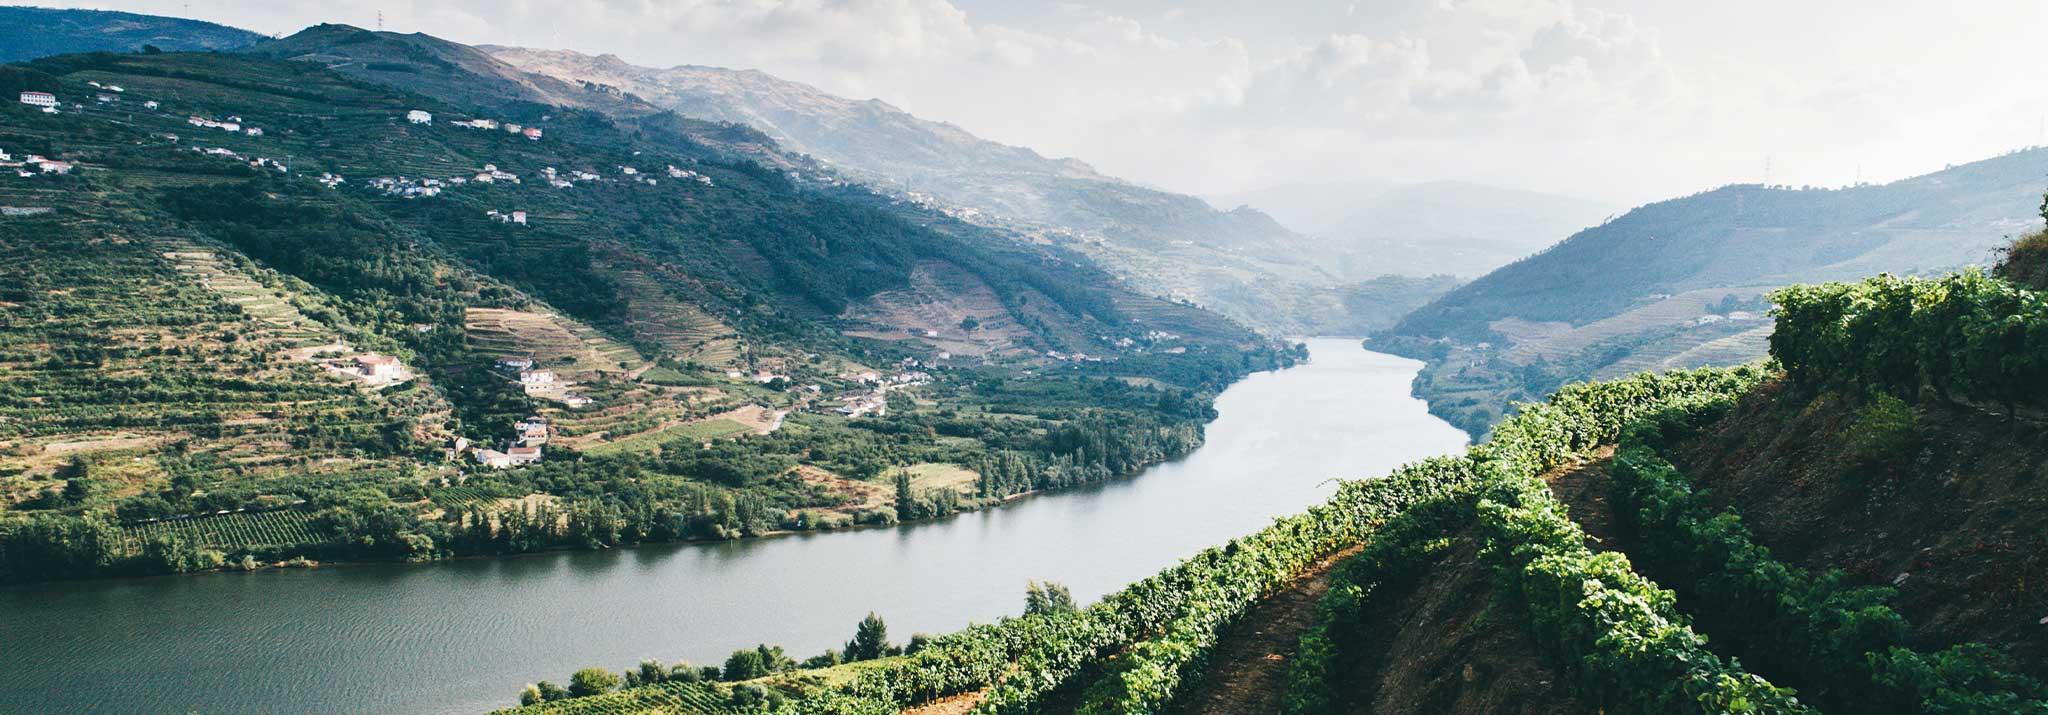 quinta-do-crasto-douro-wines-portugal